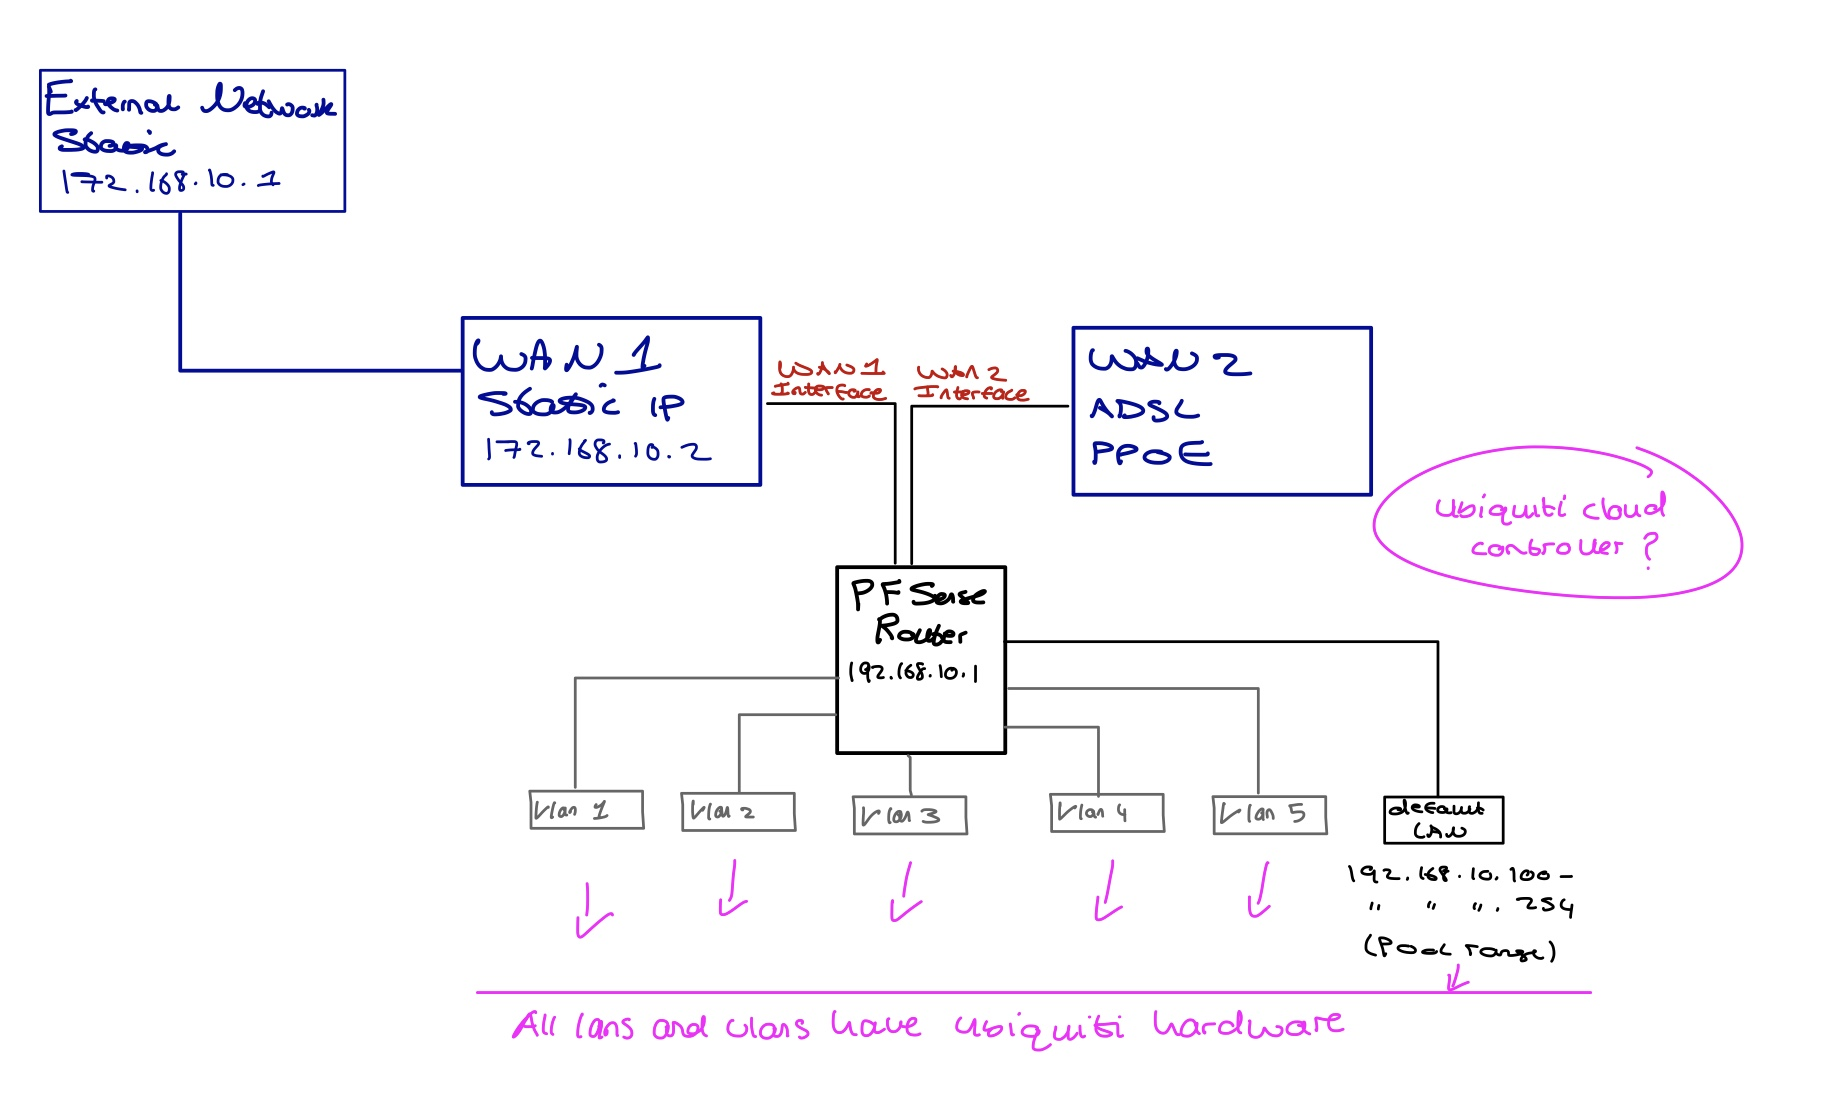 Ubiquiti cloud controller   Netgate Forum